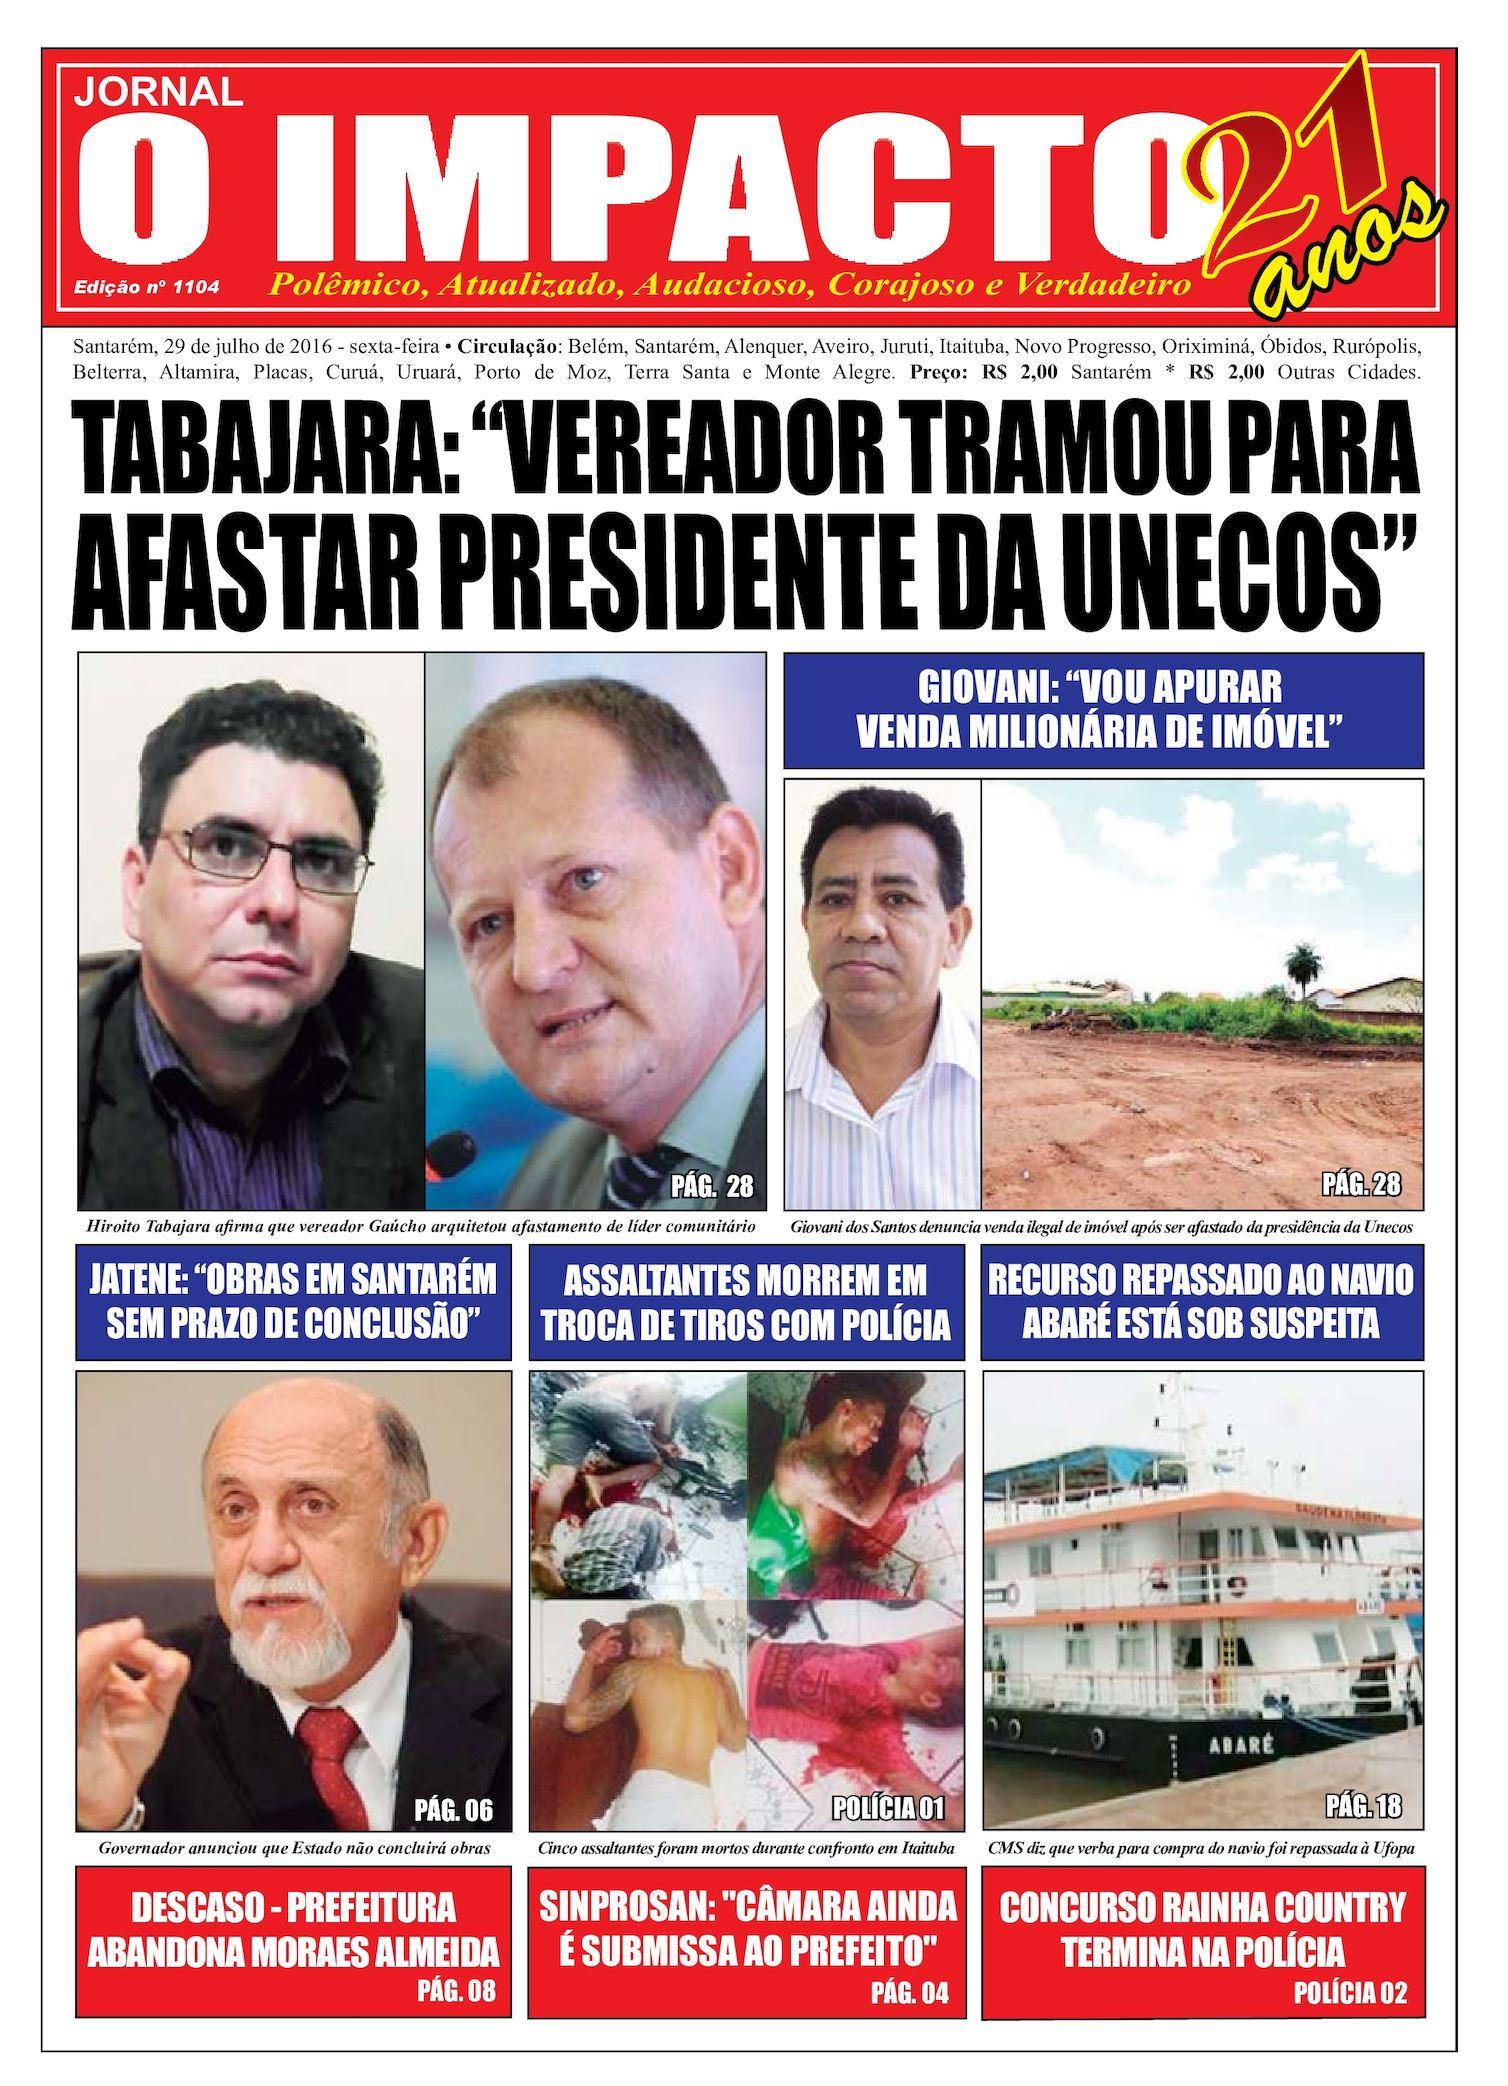 631e47b646 Calaméo - Jornal O Impacto Ed. 1104